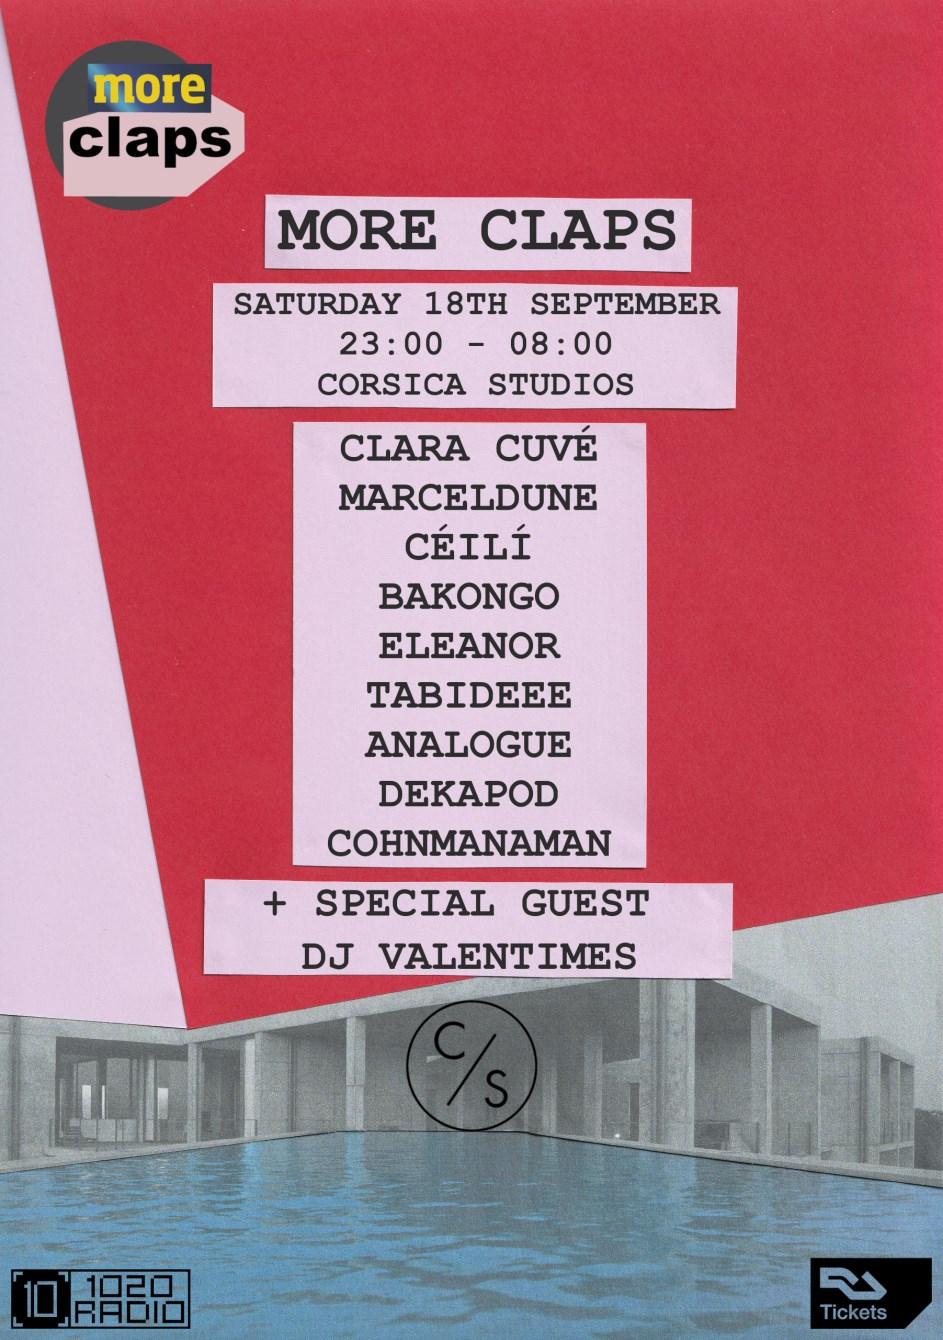 More Claps: Clara Cuvé, MarcelDune, DJ Valentimes, Céilí, Bakongo, ELEANOR, Tabideee - Flyer front